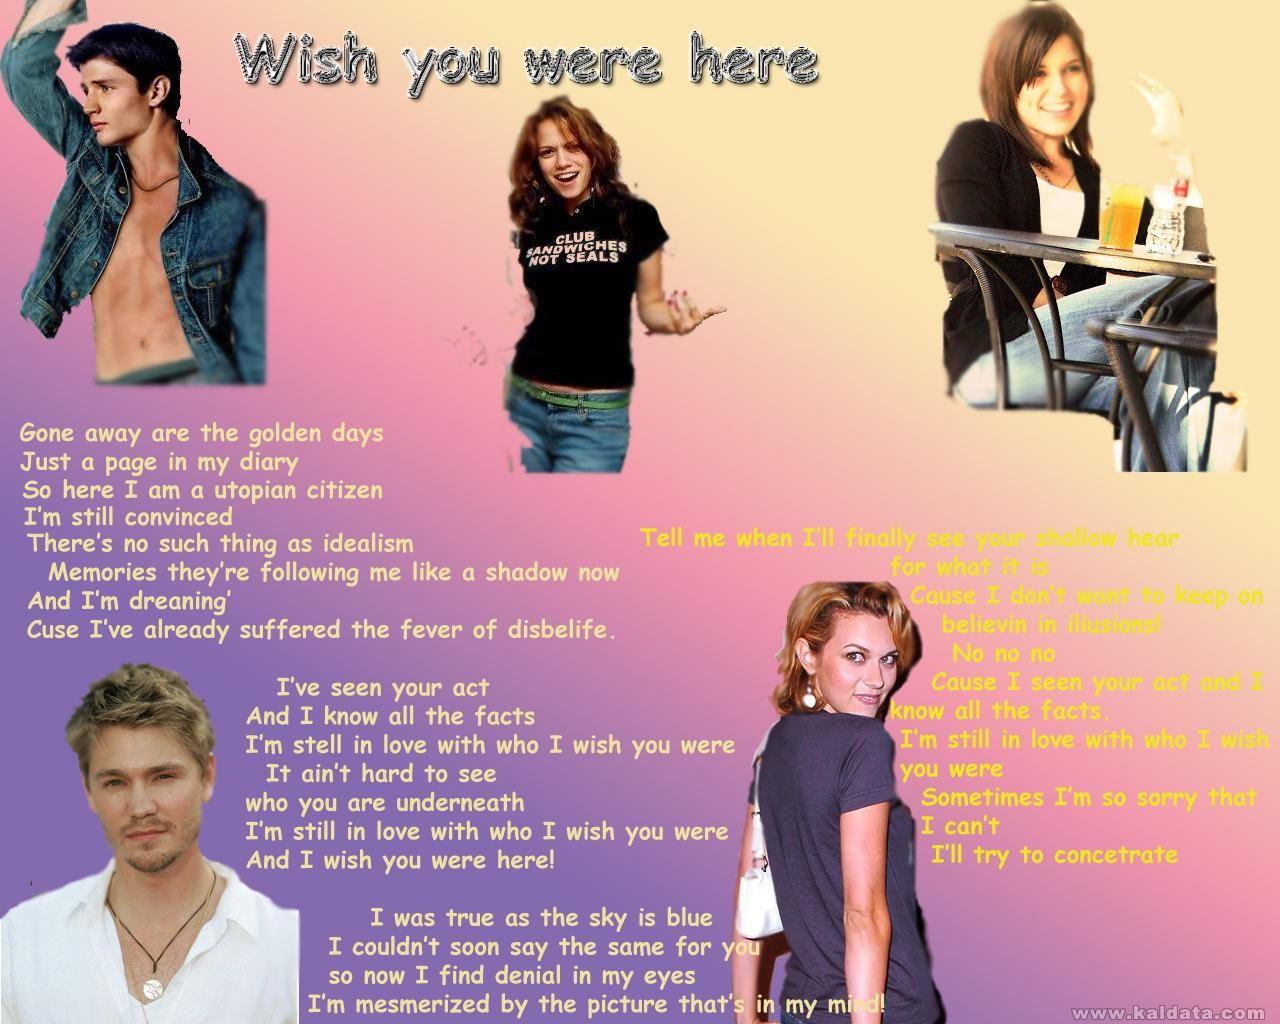 wish-you-were-here.jpg